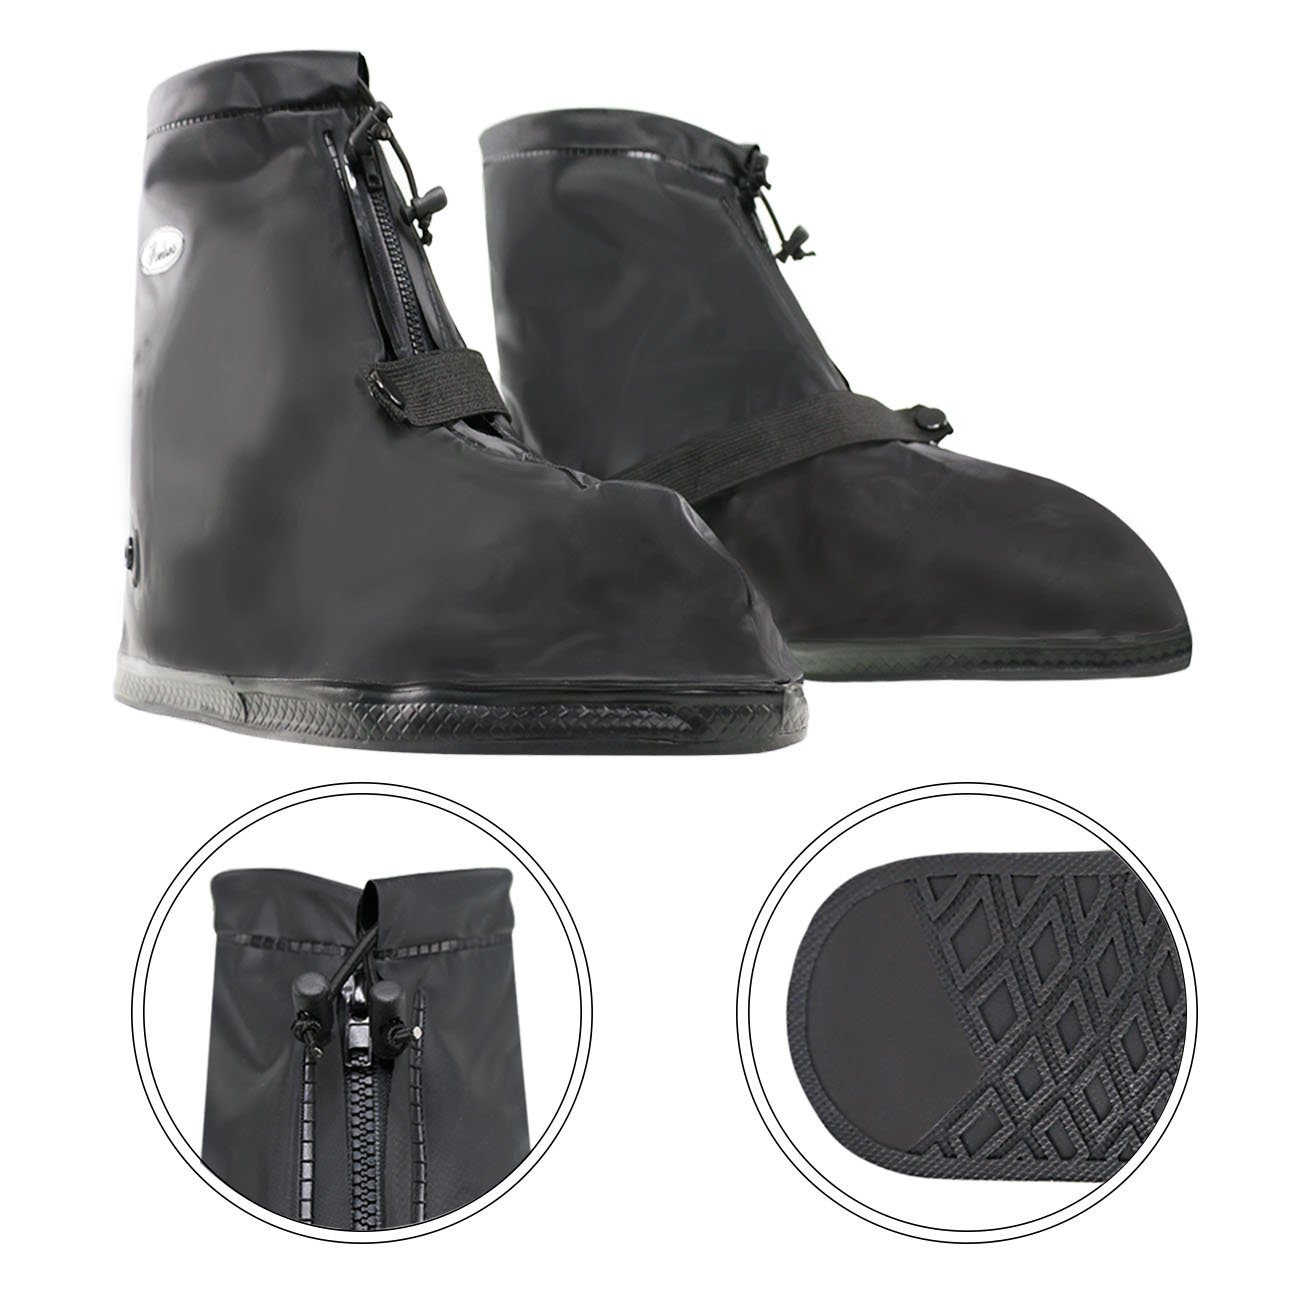 Life-C Black Waterproof Snow Rain Shoes Covers Women Men XXXXL by Life-C (Image #3)